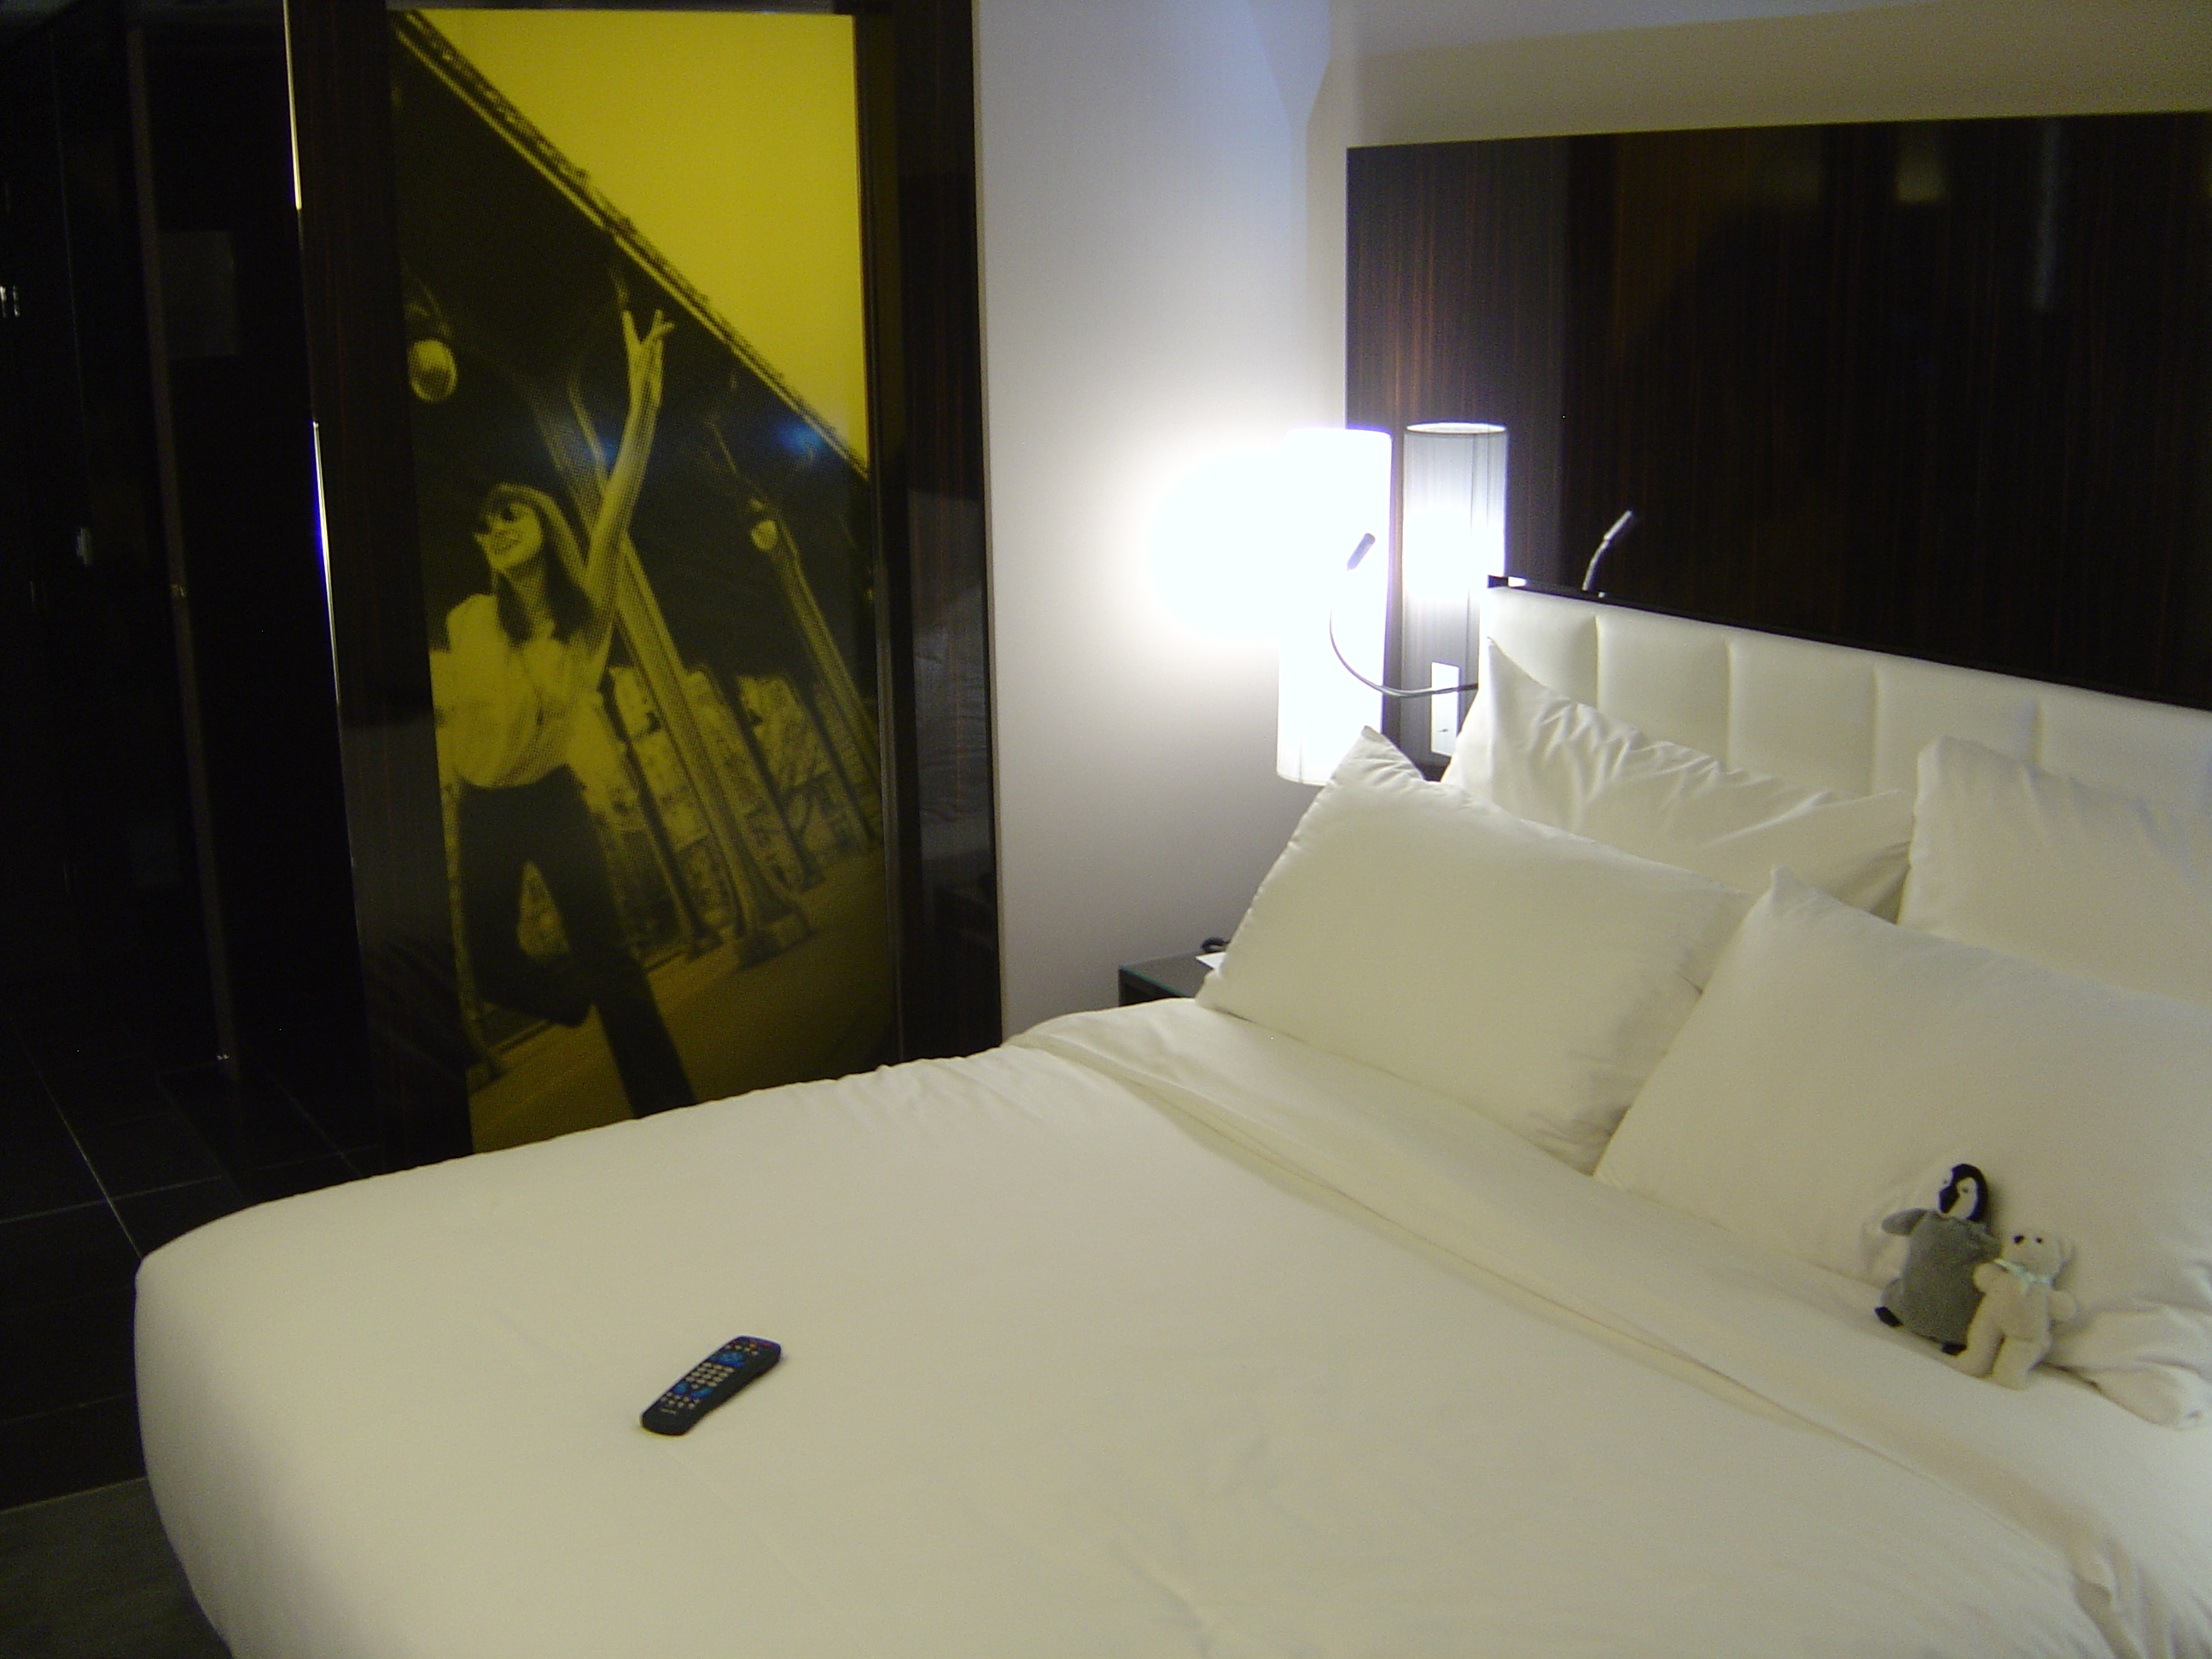 Hotel meridien parigi excellent le meridien etoile photo - Hotel meridien paris porte maillot ...